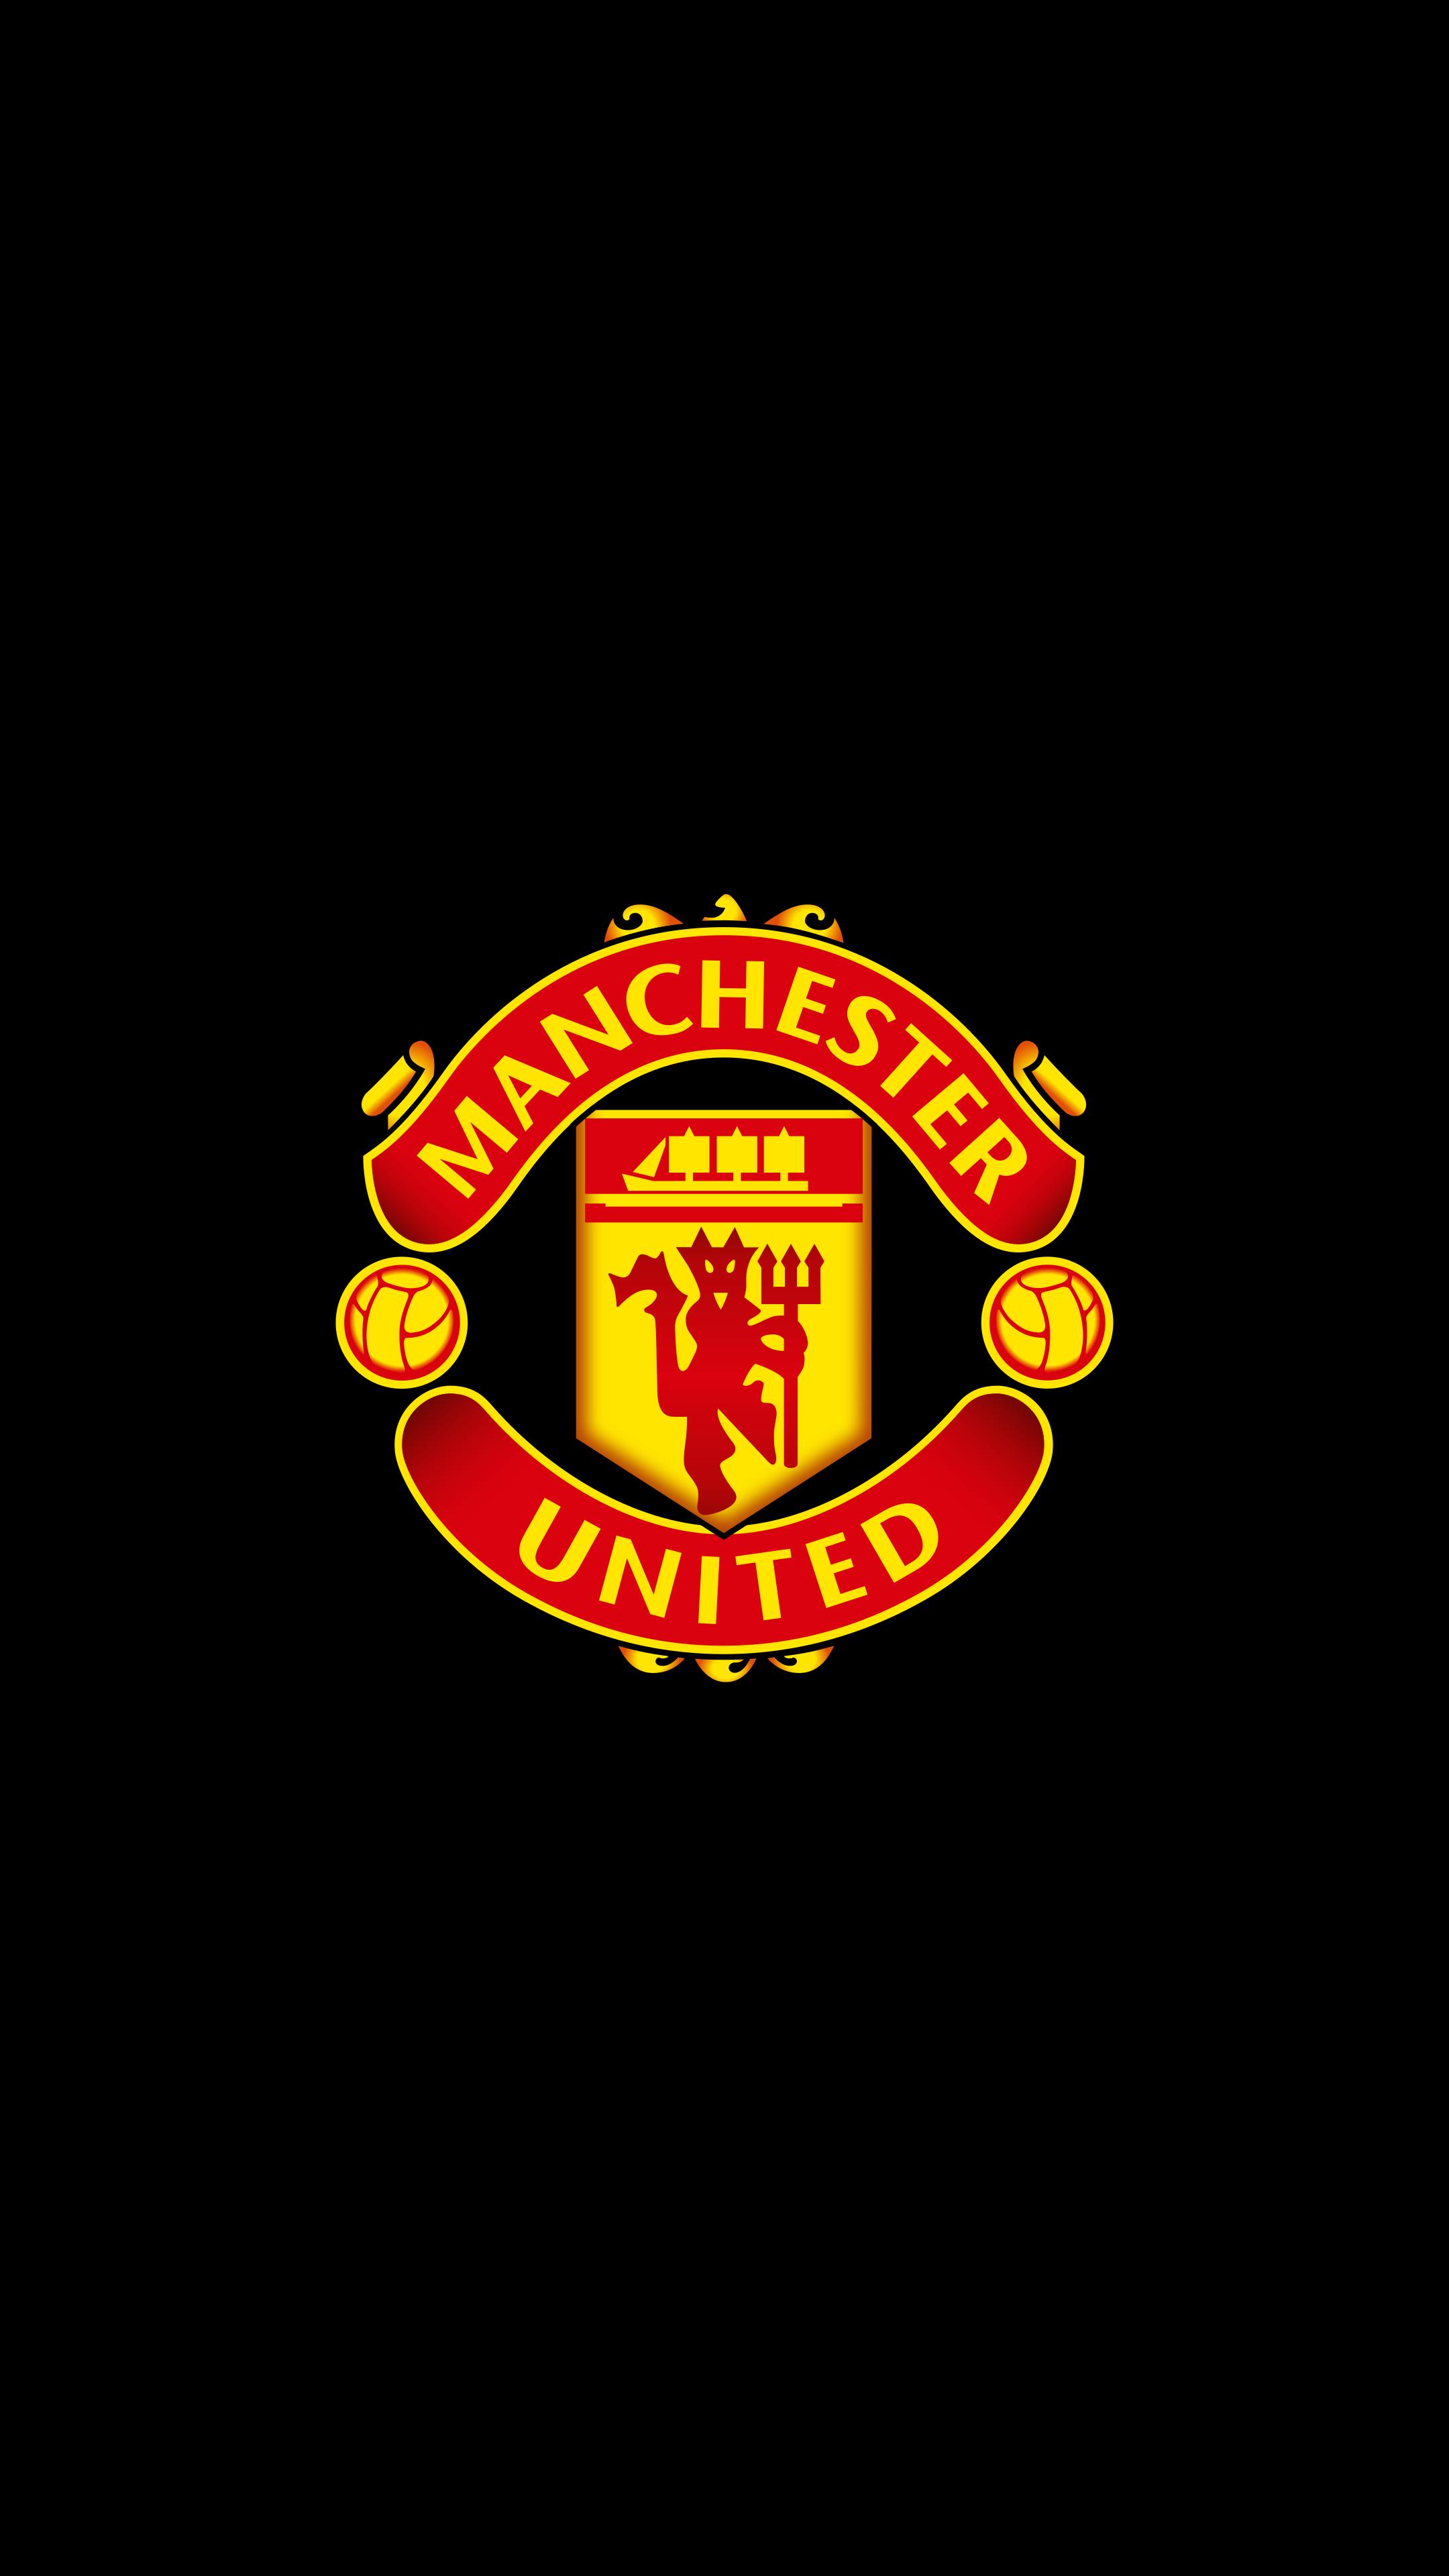 manchester united 2160p 4k oled wallpaper แมนเชสเตอร ย ไนเต ด หน งค ายมาร เวล วอลเปเปอร manchester united 2160p 4k oled